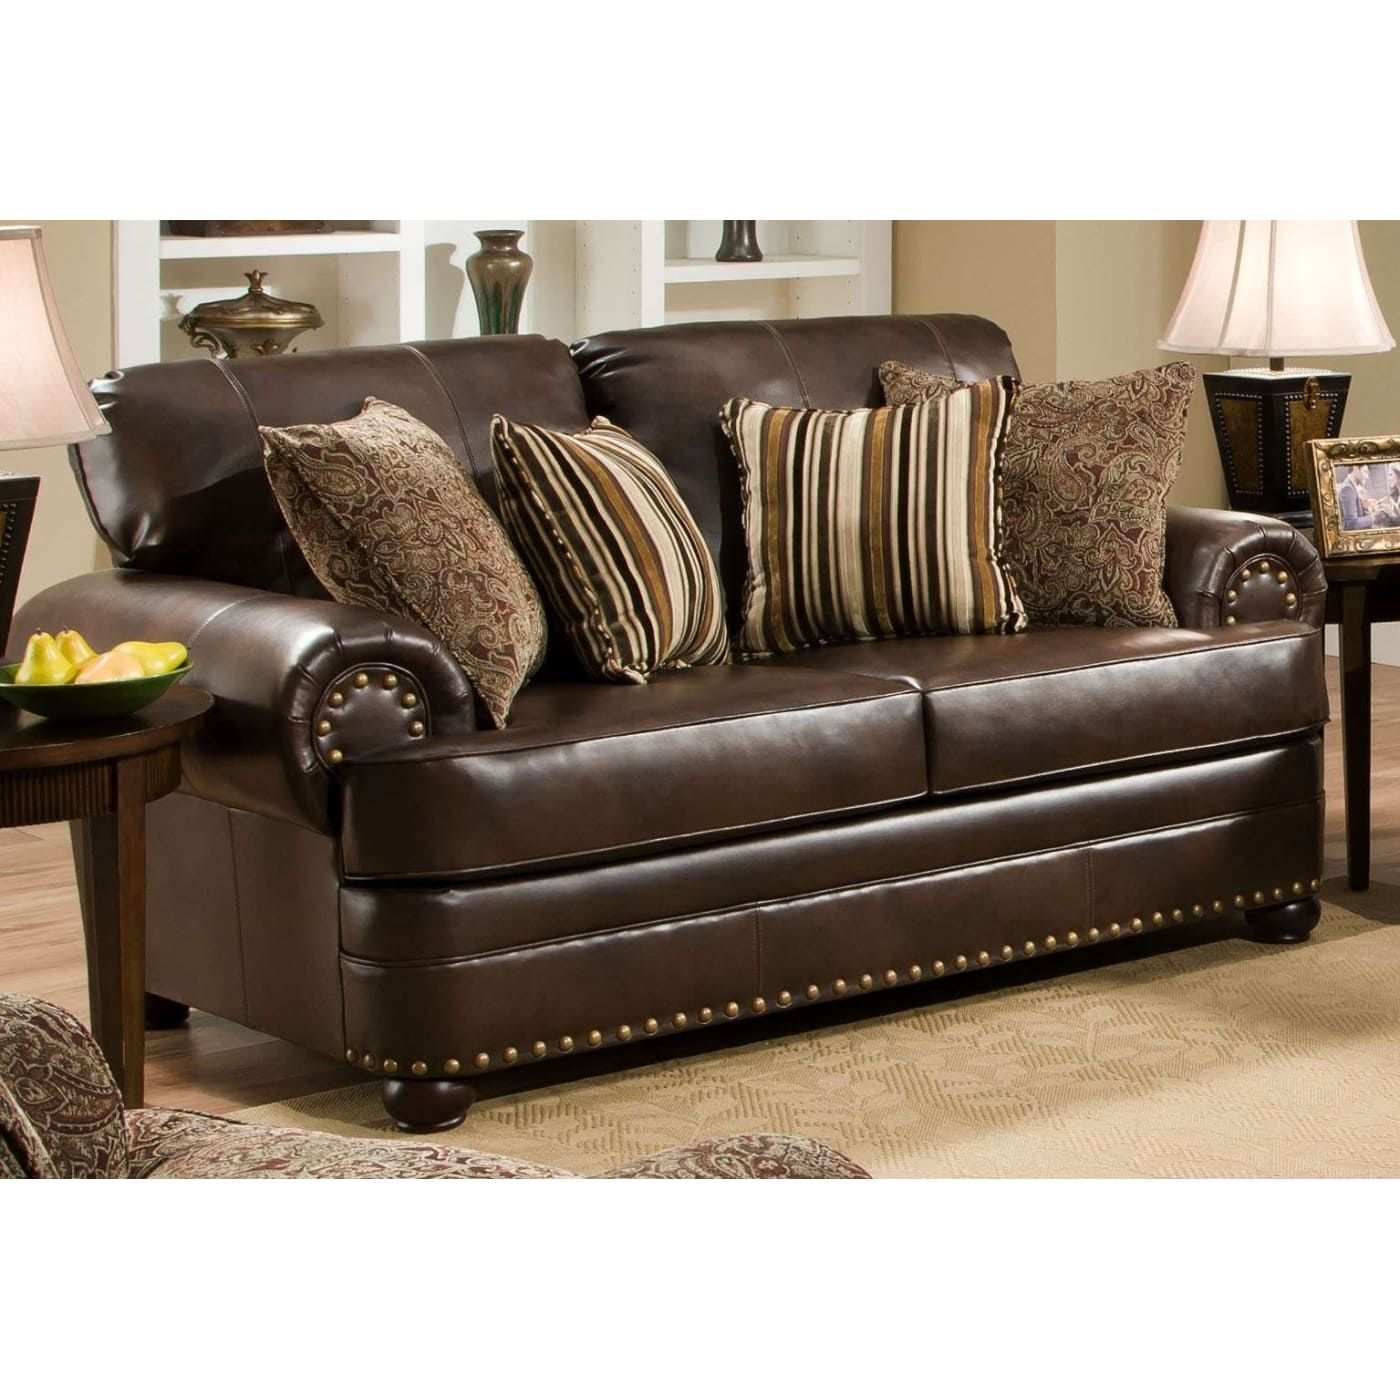 Simmons 7531 02 Saddle Leather Sofa Loveseat Simmons Furniture